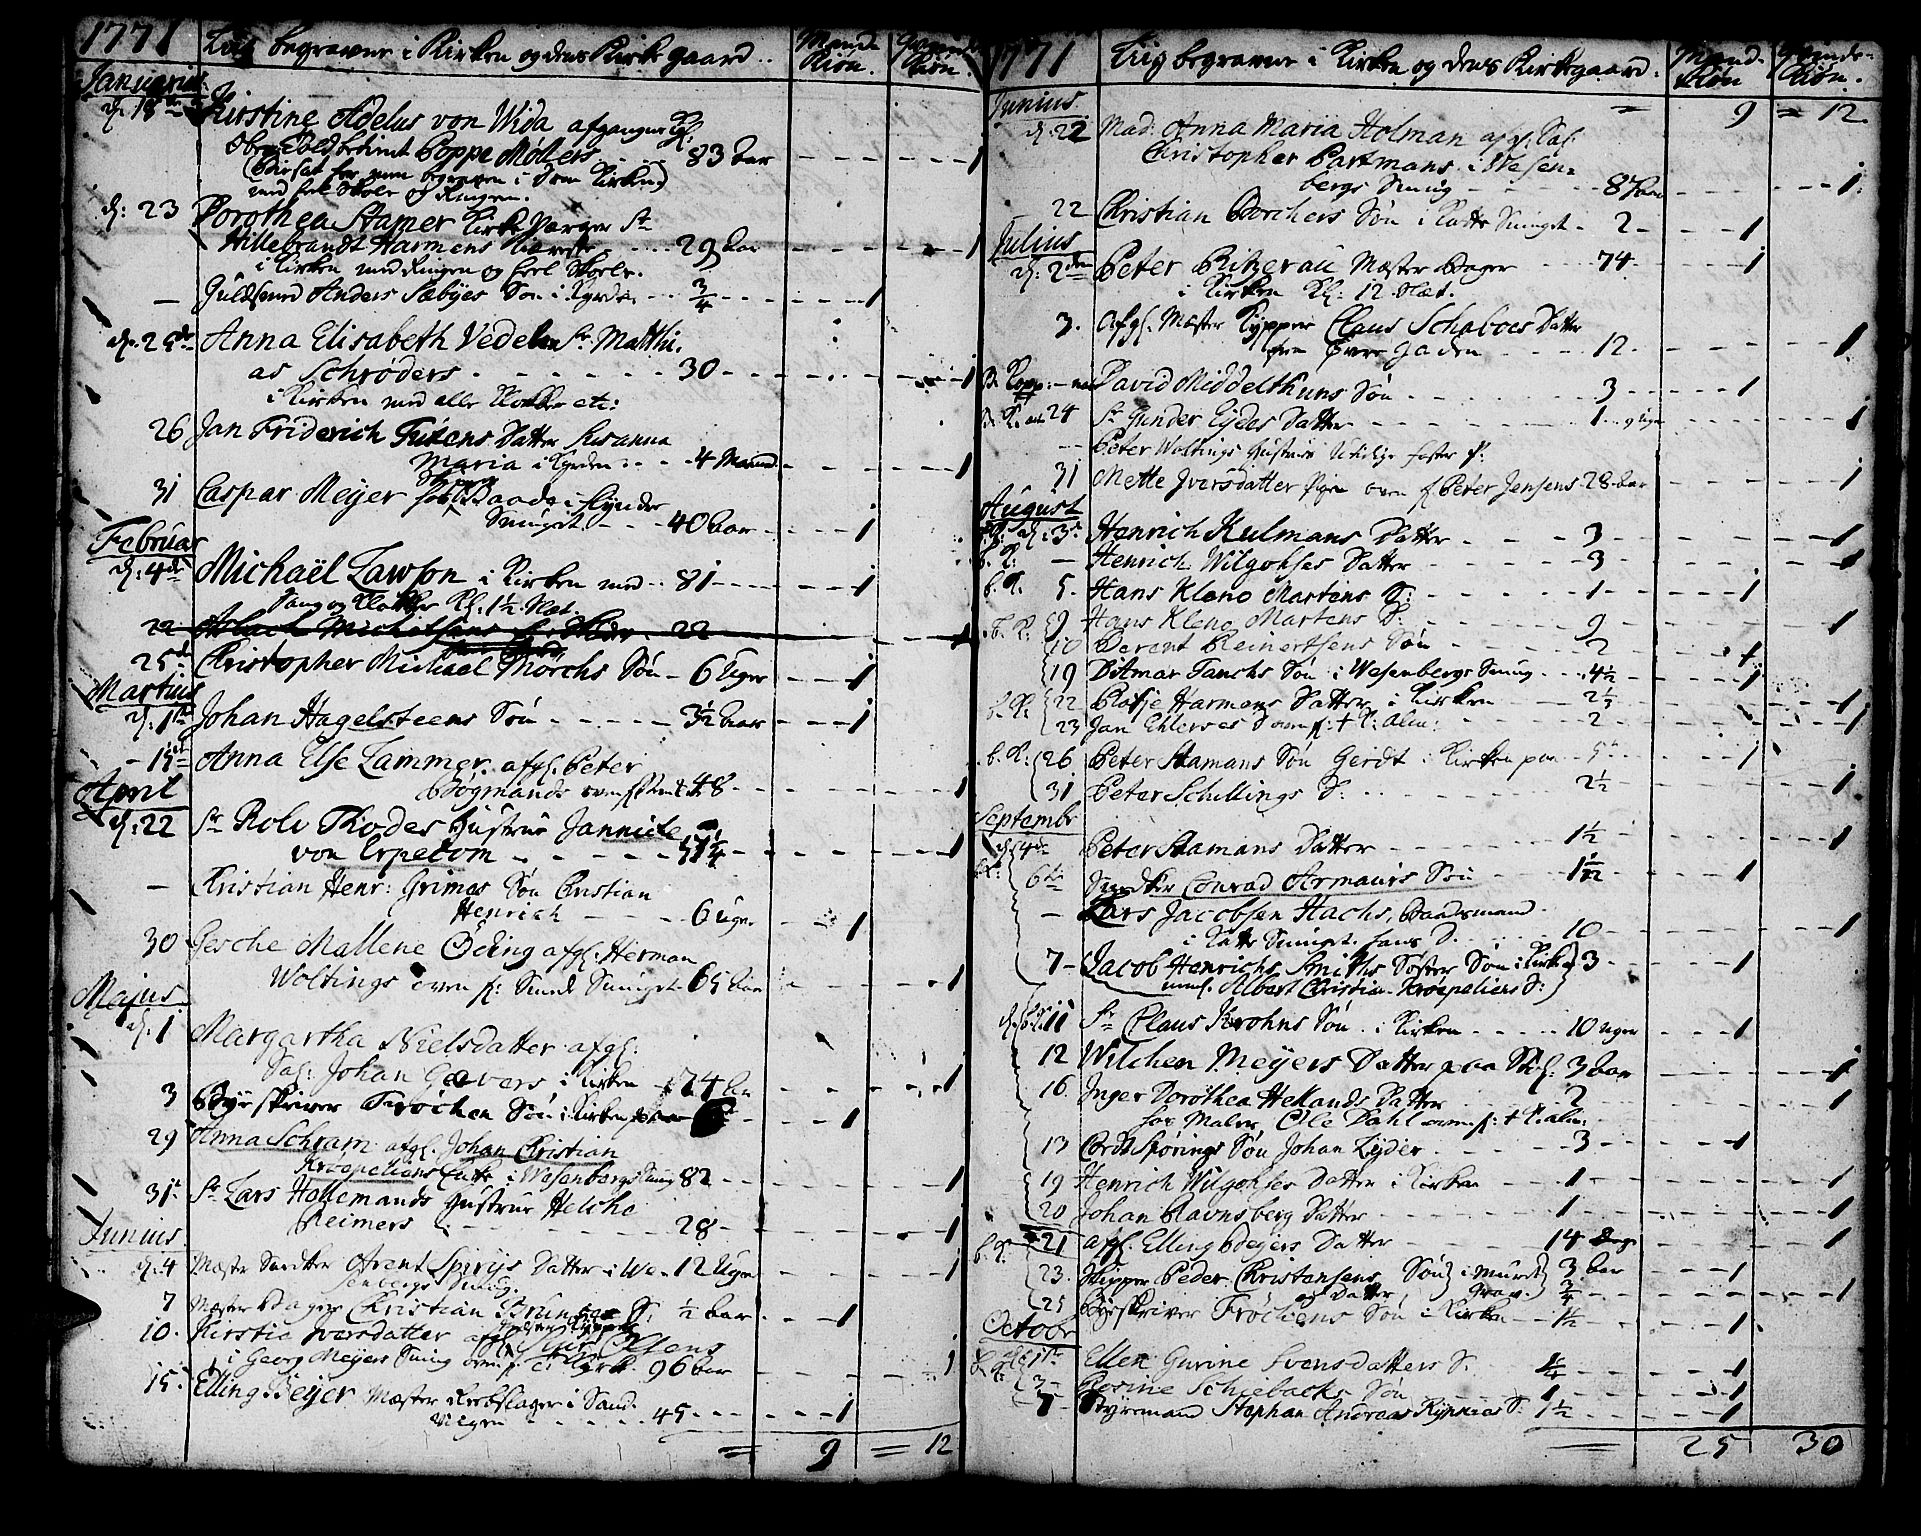 SAB, Korskirken Sokneprestembete, H/Haa/L0011: Ministerialbok nr. A 11, 1731-1785, s. 150